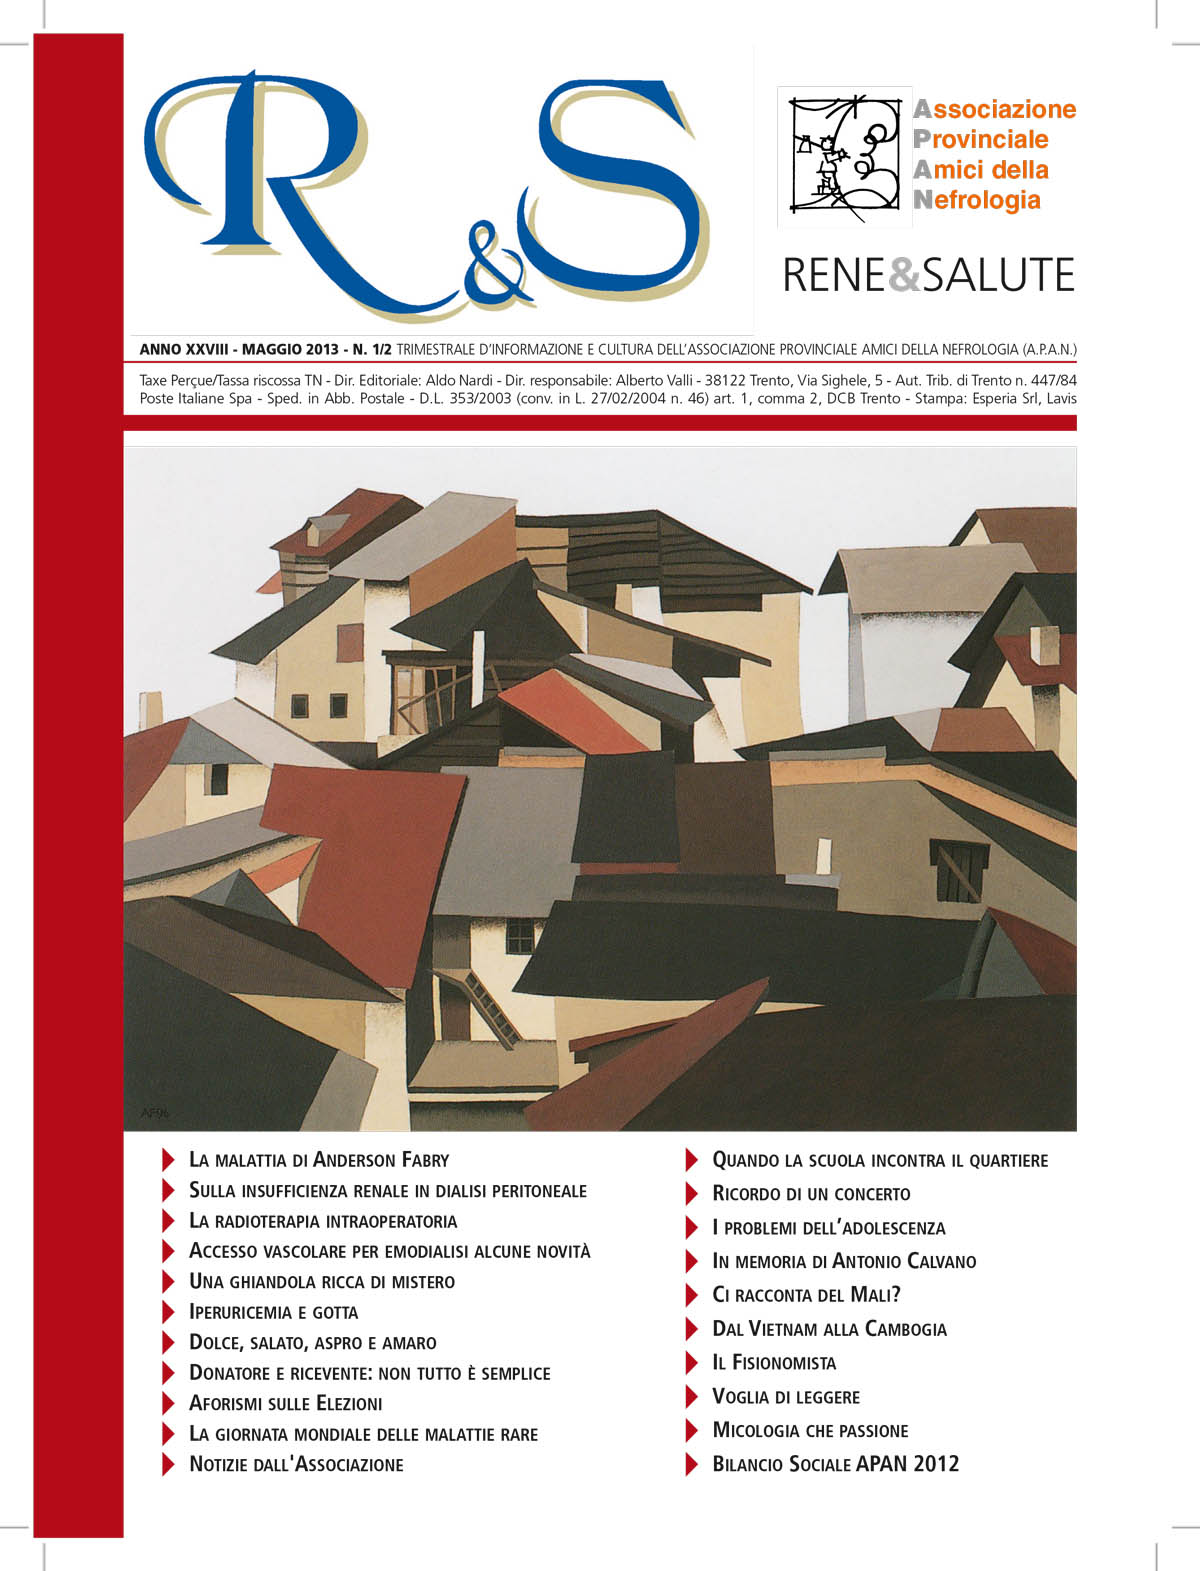 Rene & Salute 2013.1-1